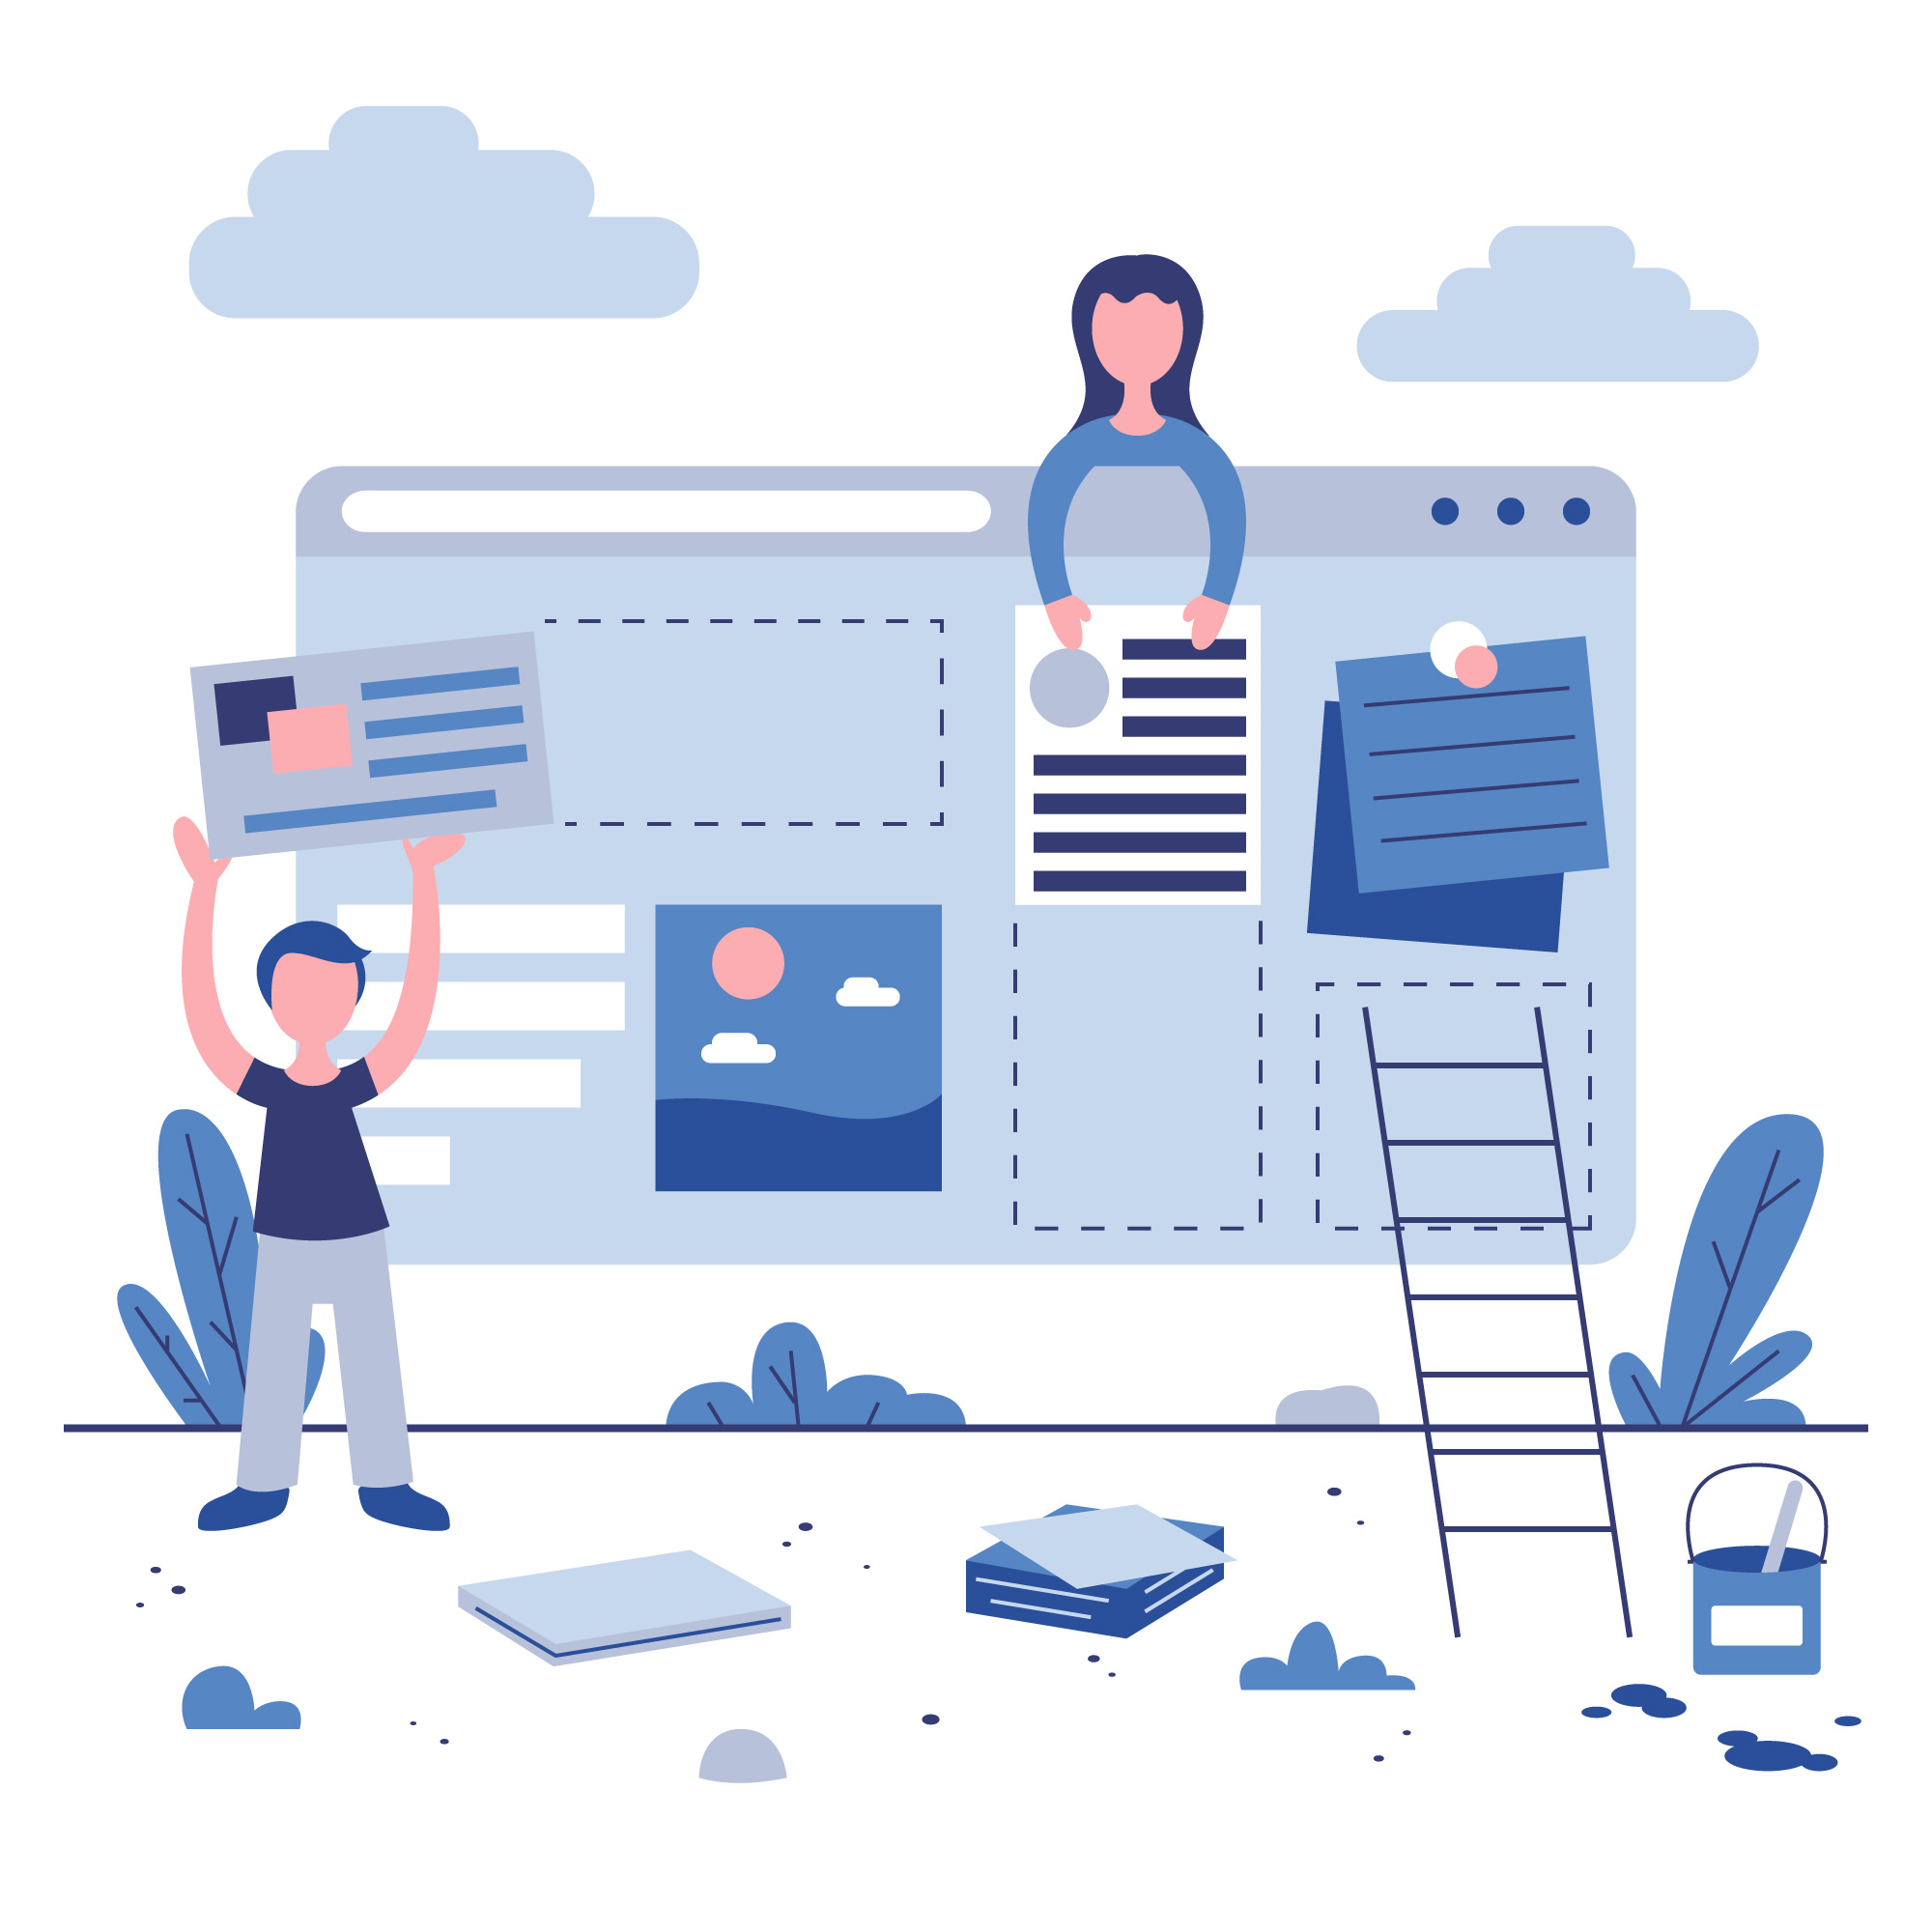 Hoe ziet de ideale webdesign eruit